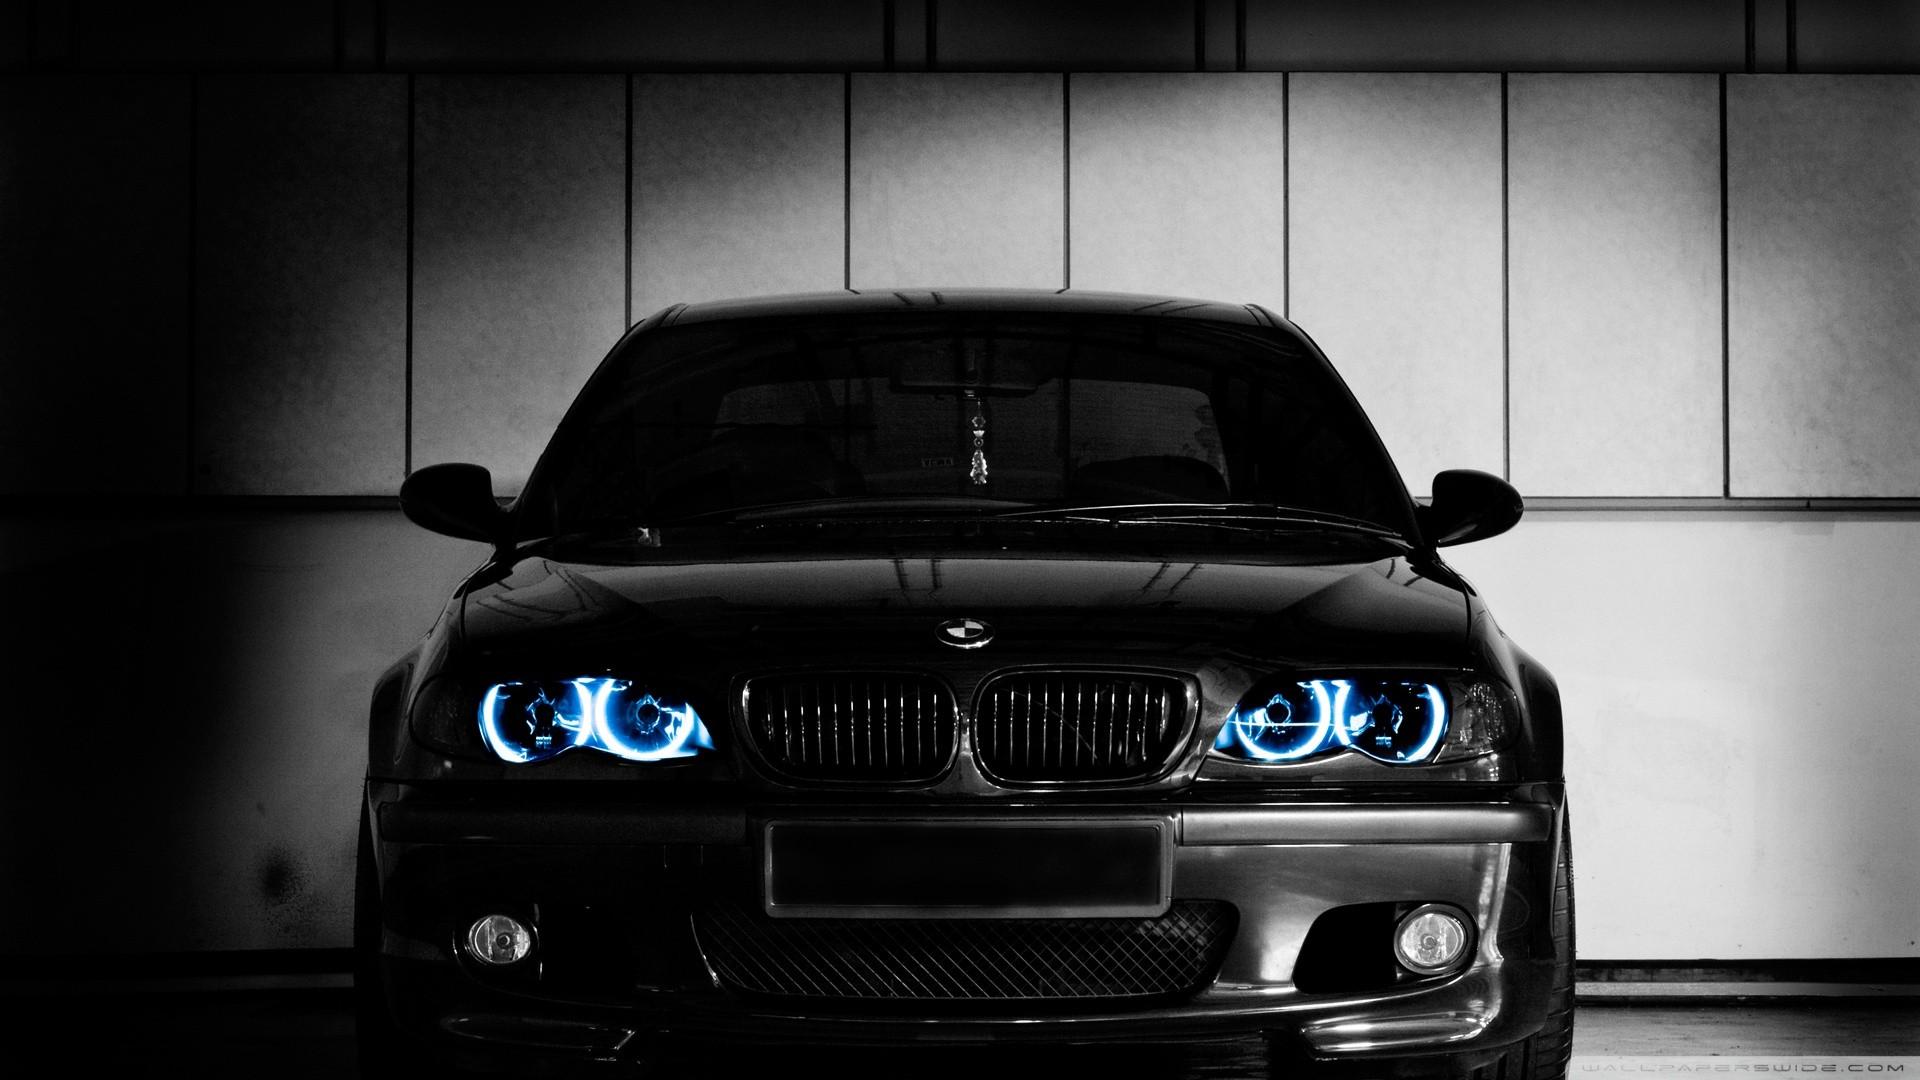 BMW Cars Wallpaper 1920x1080 BMW Cars BMW M3 BMW E46 Black Cars 1920x1080